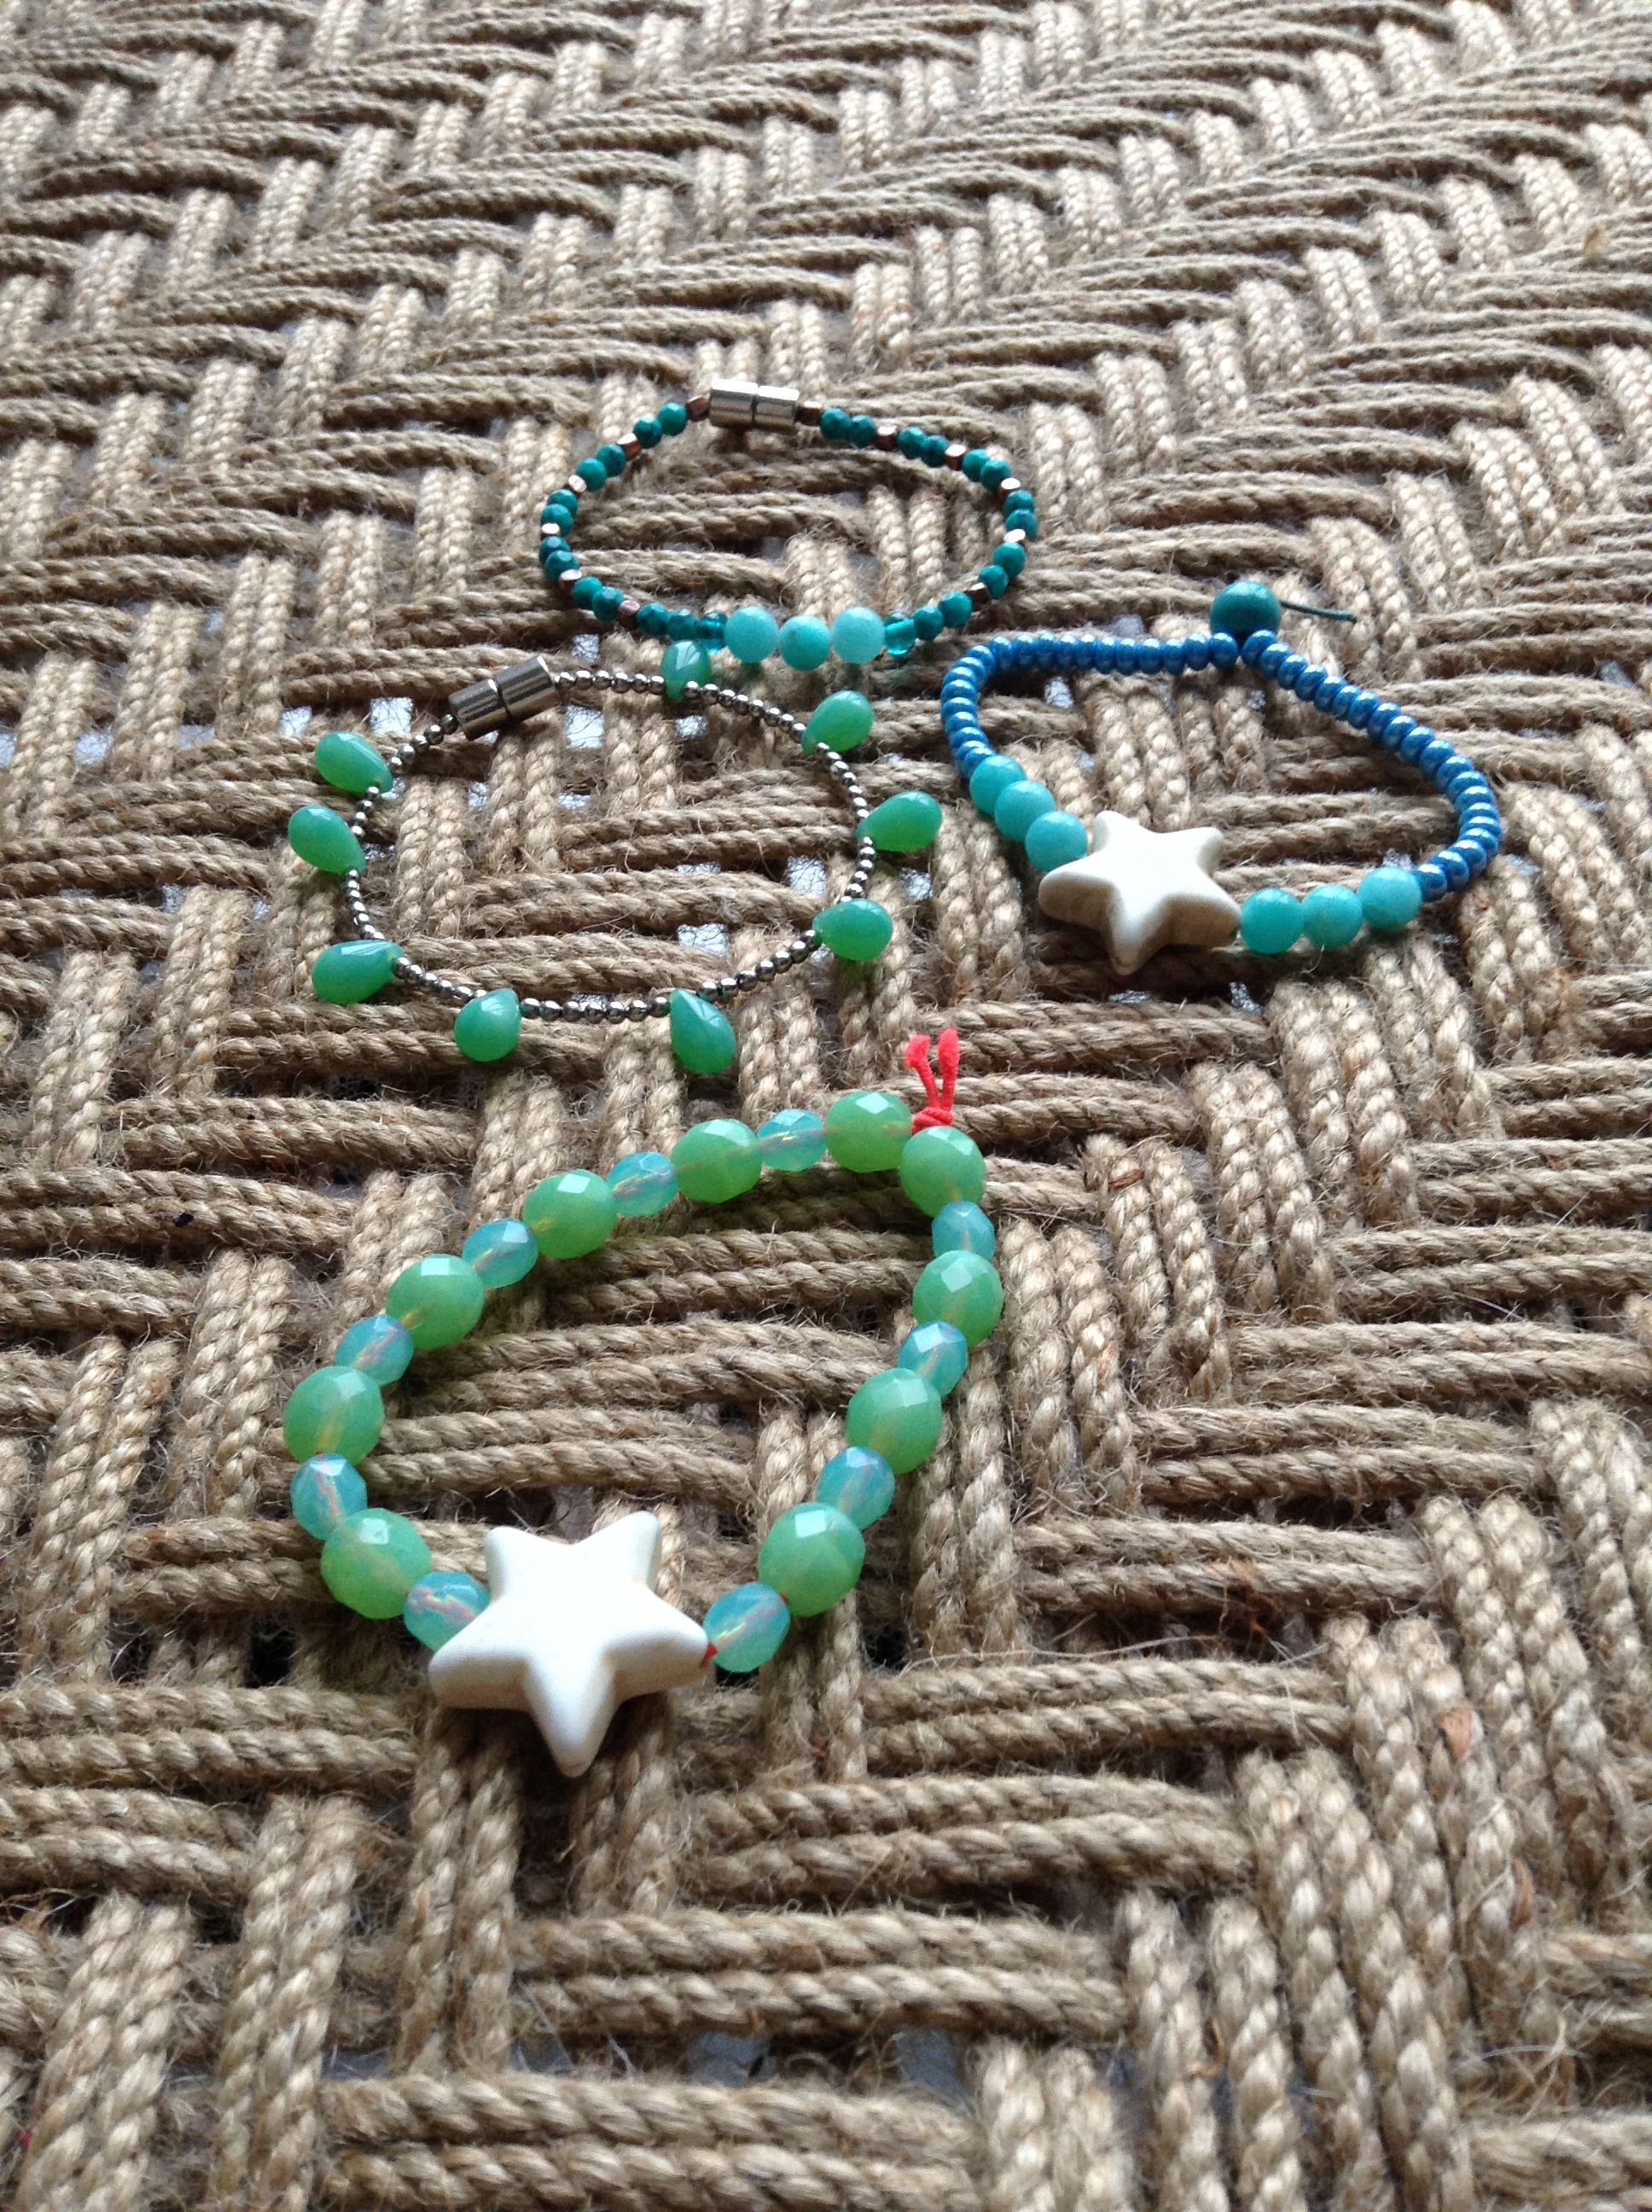 Ibiza style bracelets. Handmade and mostly recycled #omgq